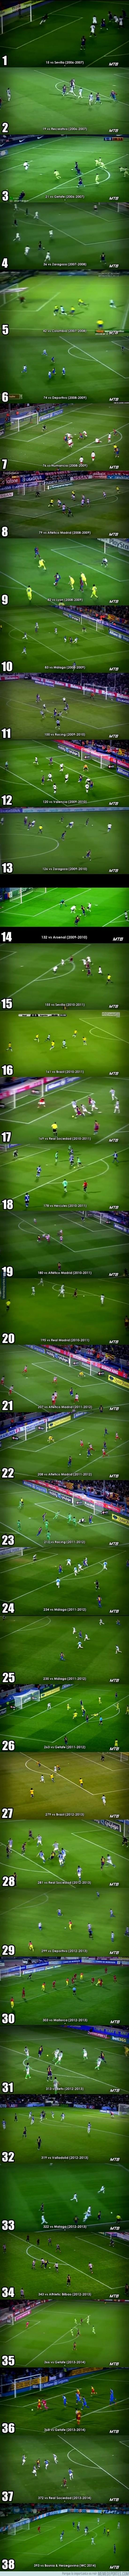 515484 - Un clásico de Messi: 38 goles pasando a 3 o más rivales